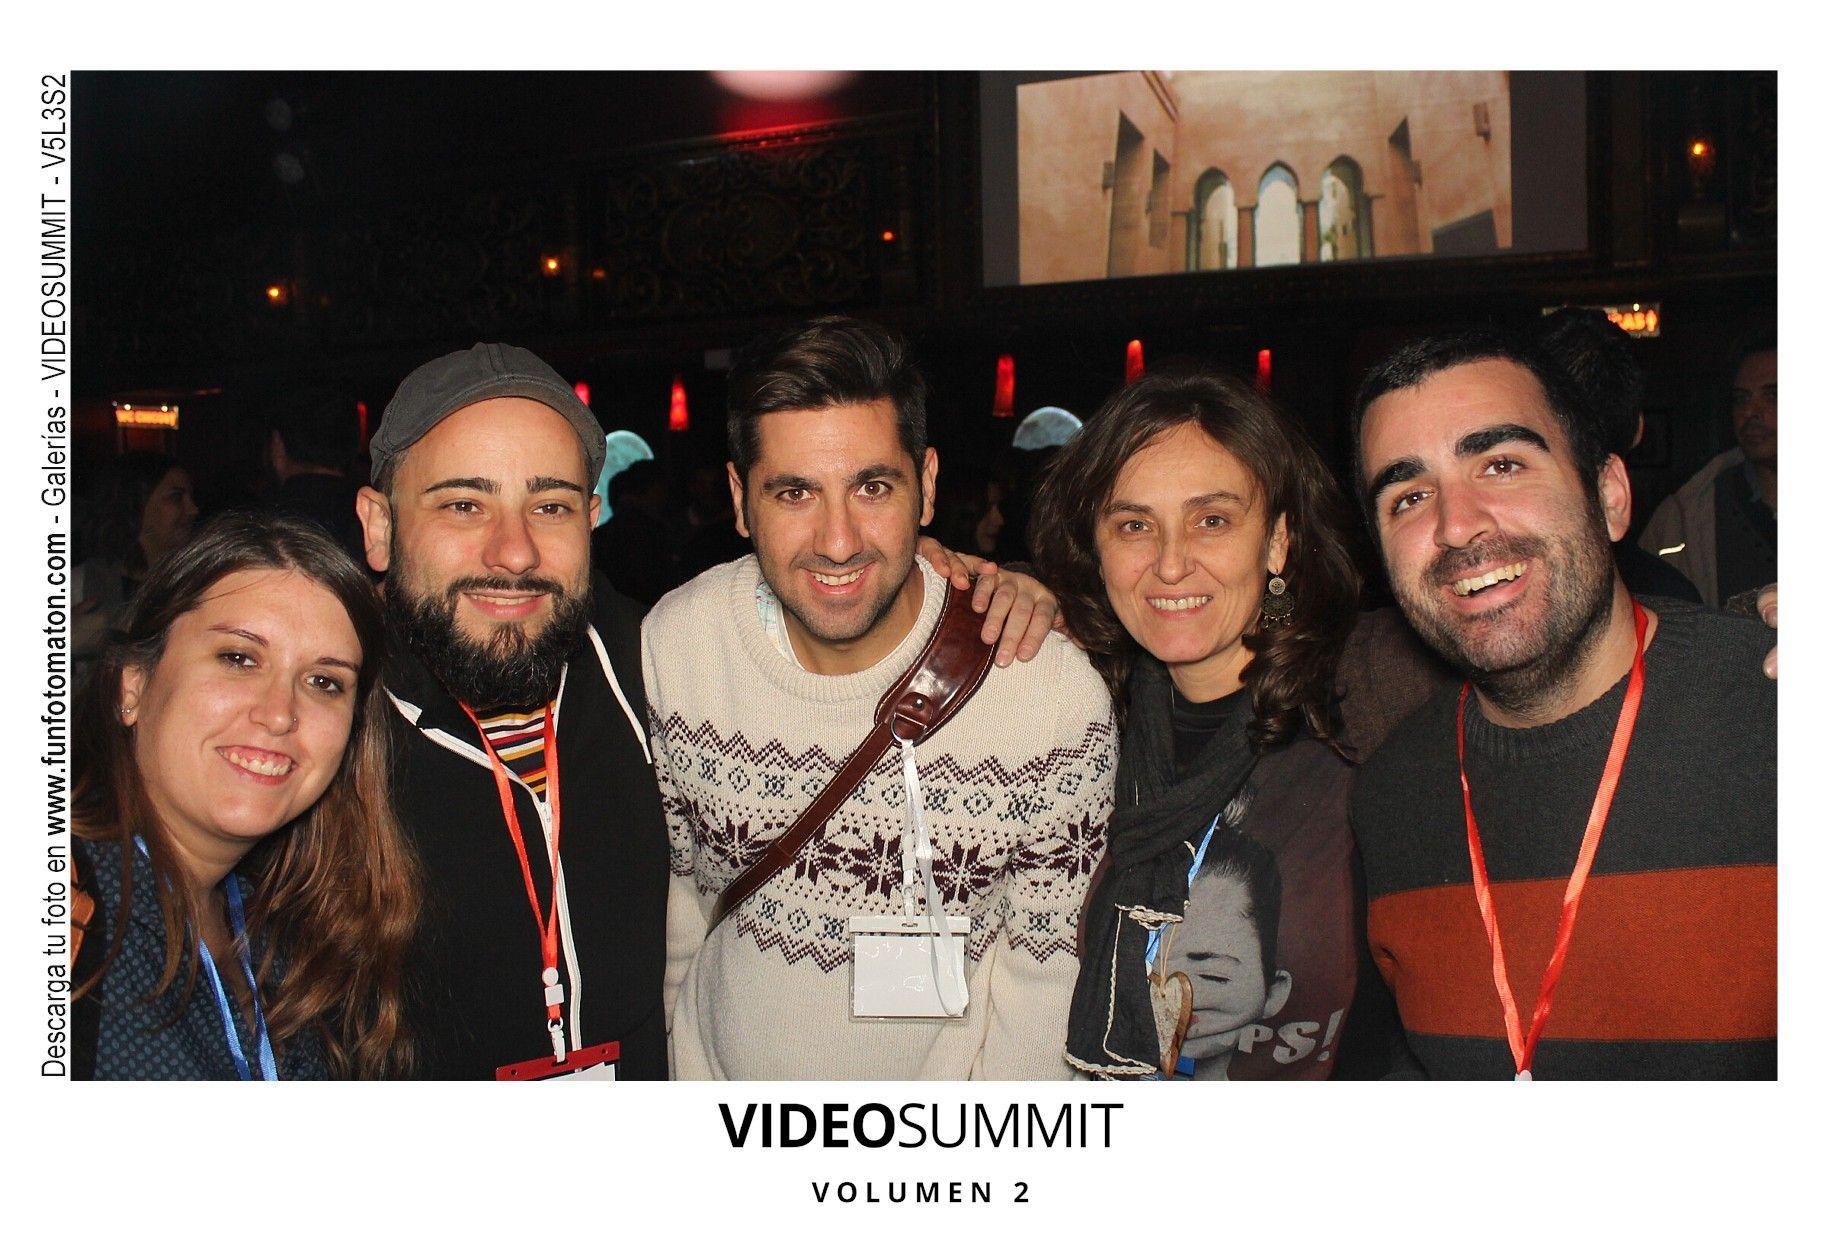 videosummit-vol2-club-party-033